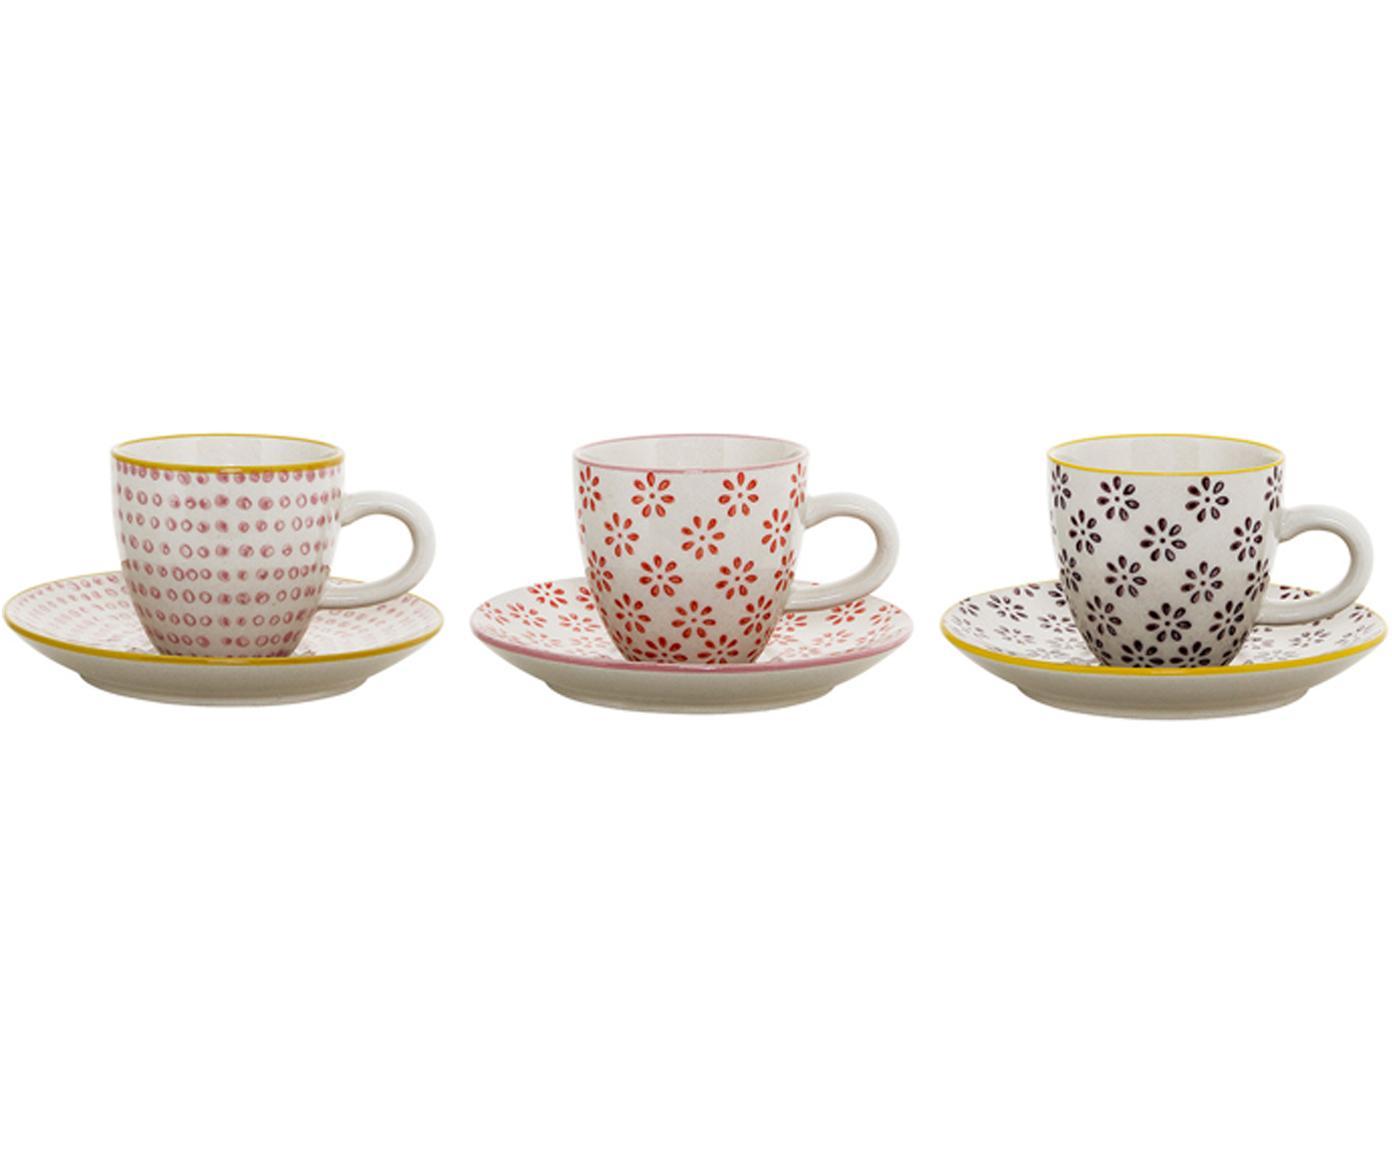 Set de tazas de café Line, 6pzas., Cerámica, Blanco, rojo, rosa, negro, amarillo, Ø 6 x Al 6 cm